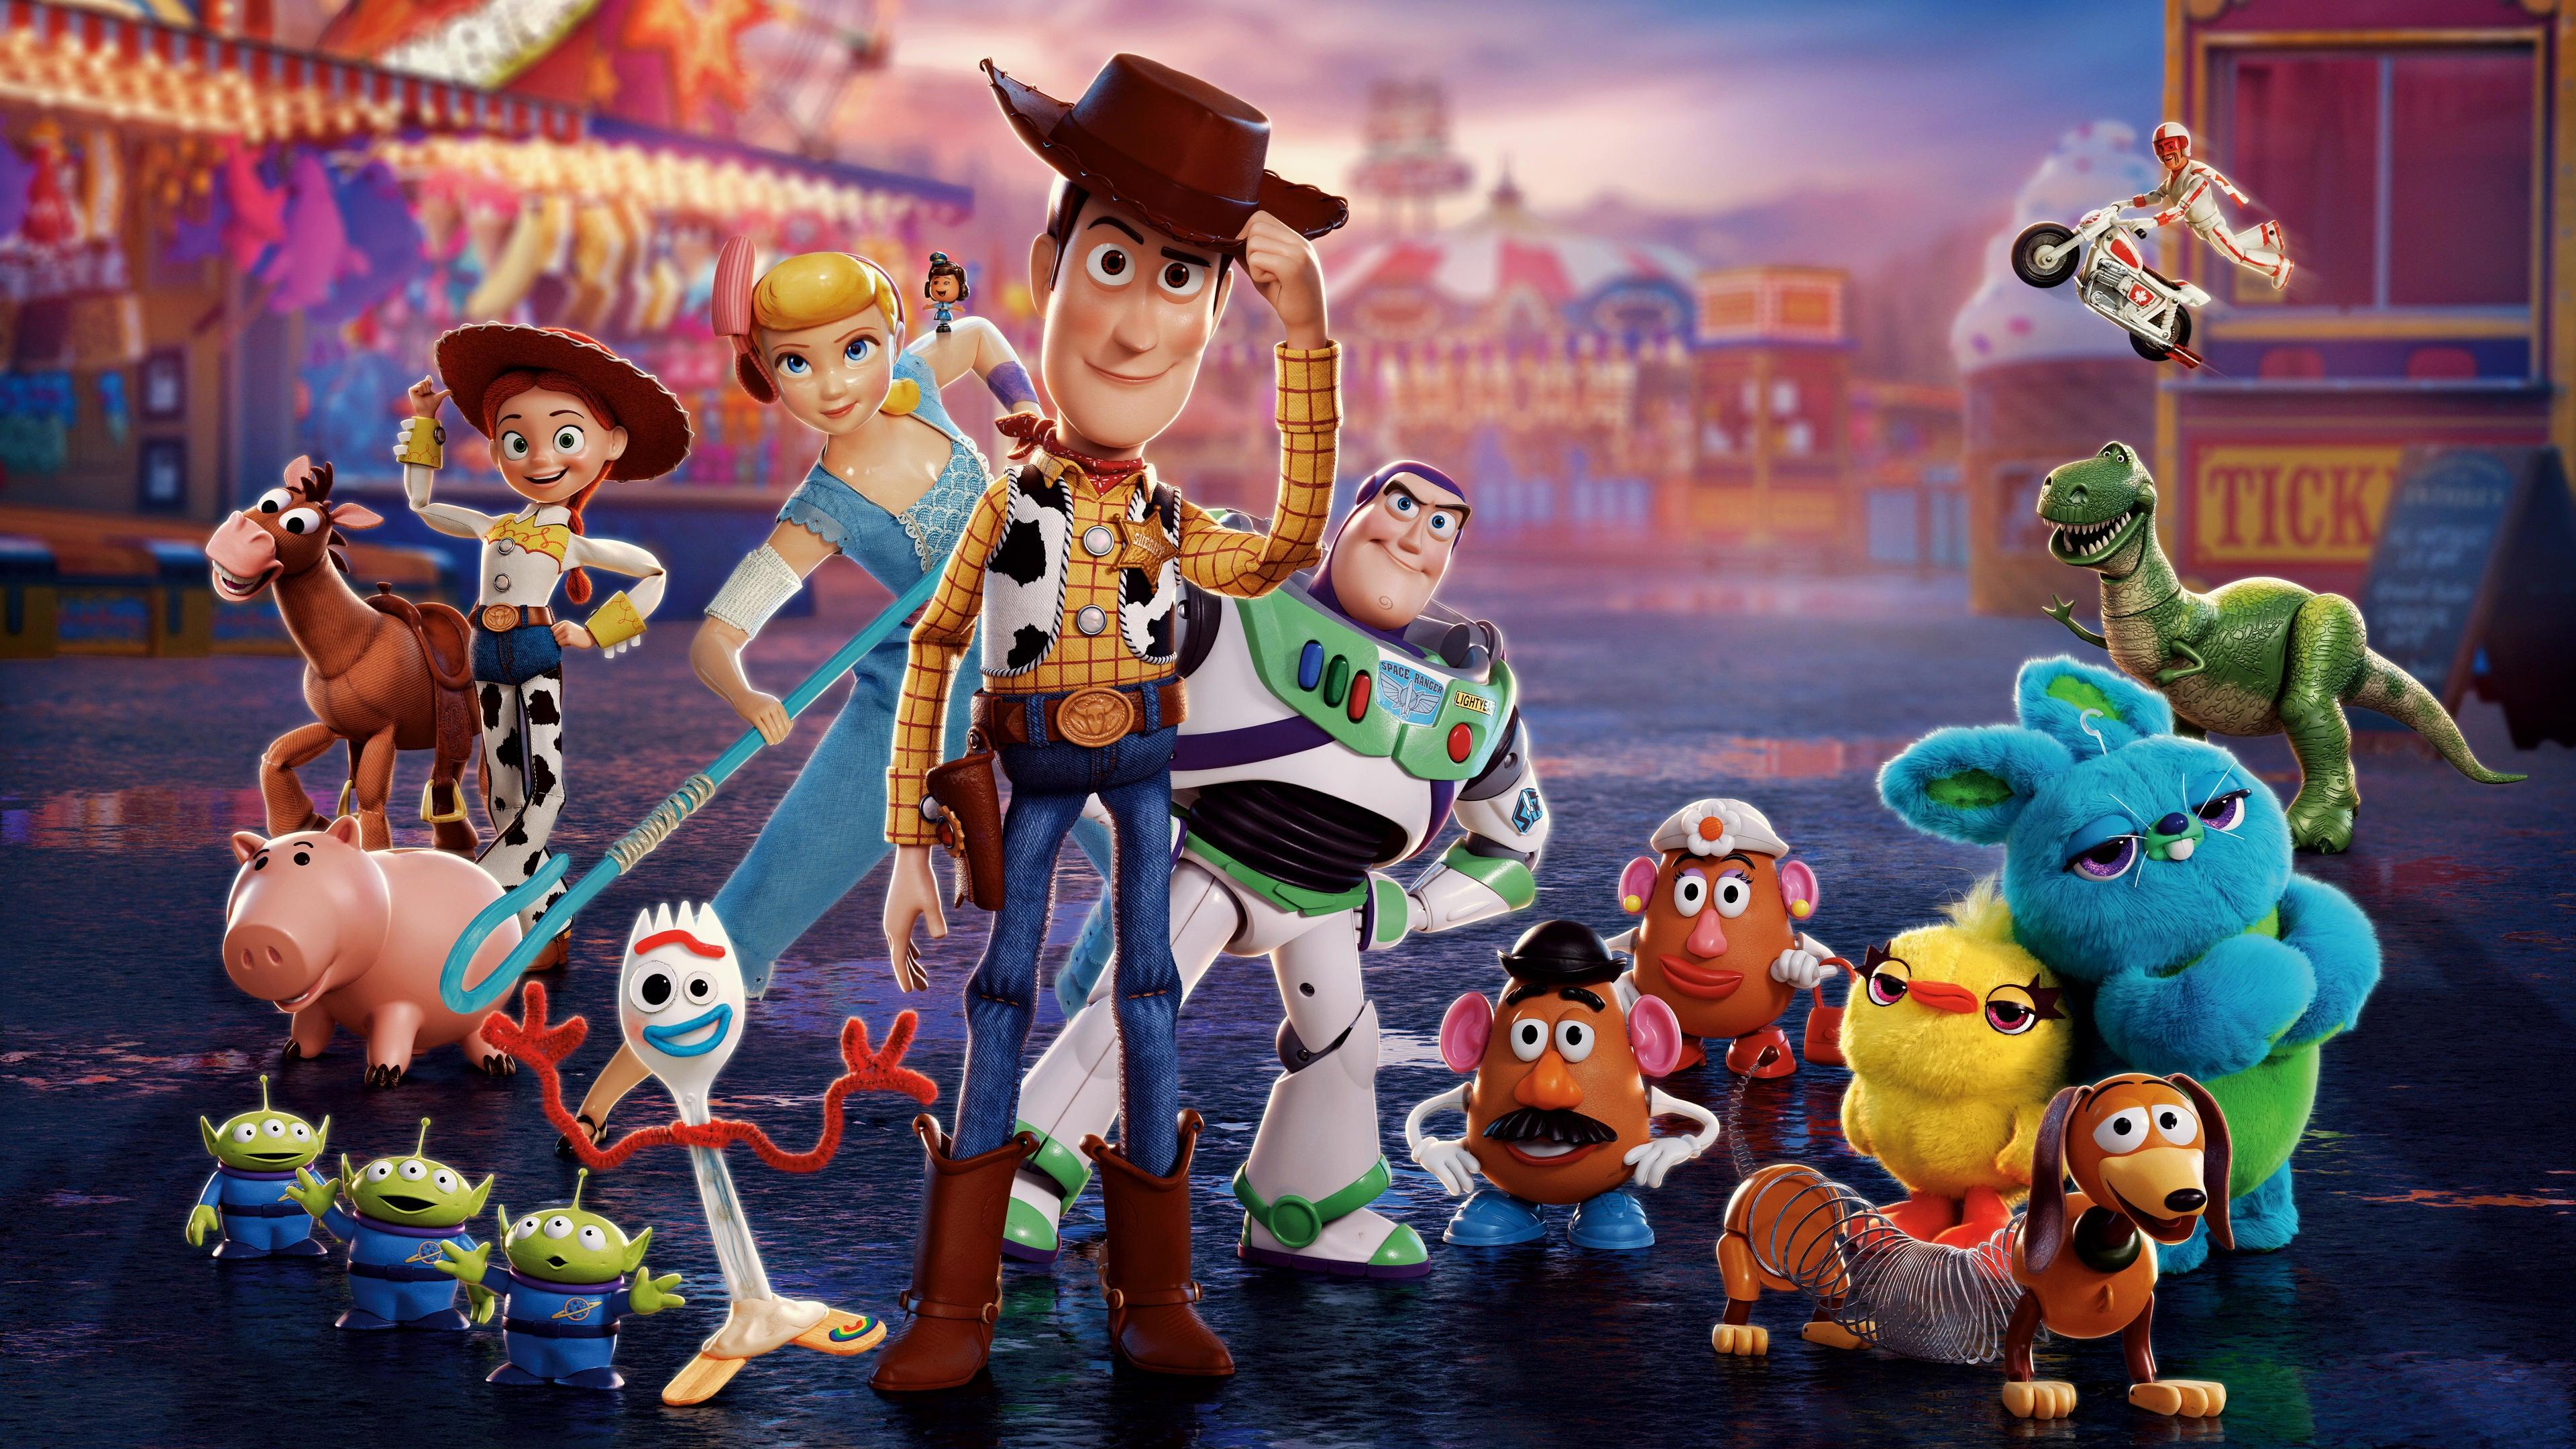 Fondos de pantalla Toy Story 4 Personajes Poster